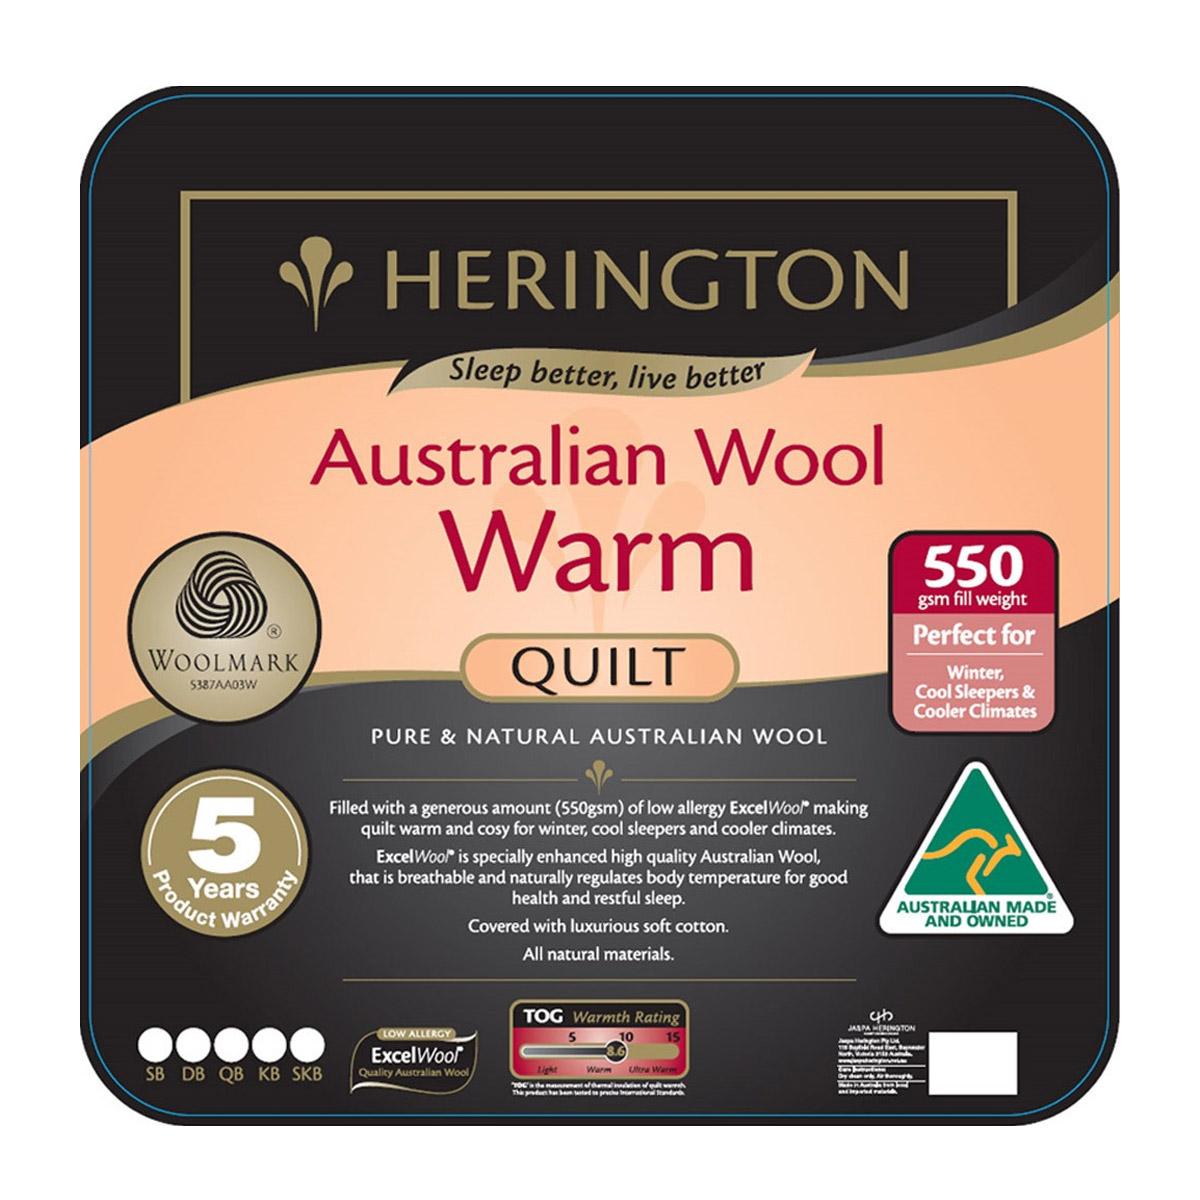 Herington Winter Warmth Australian Wool Quilt